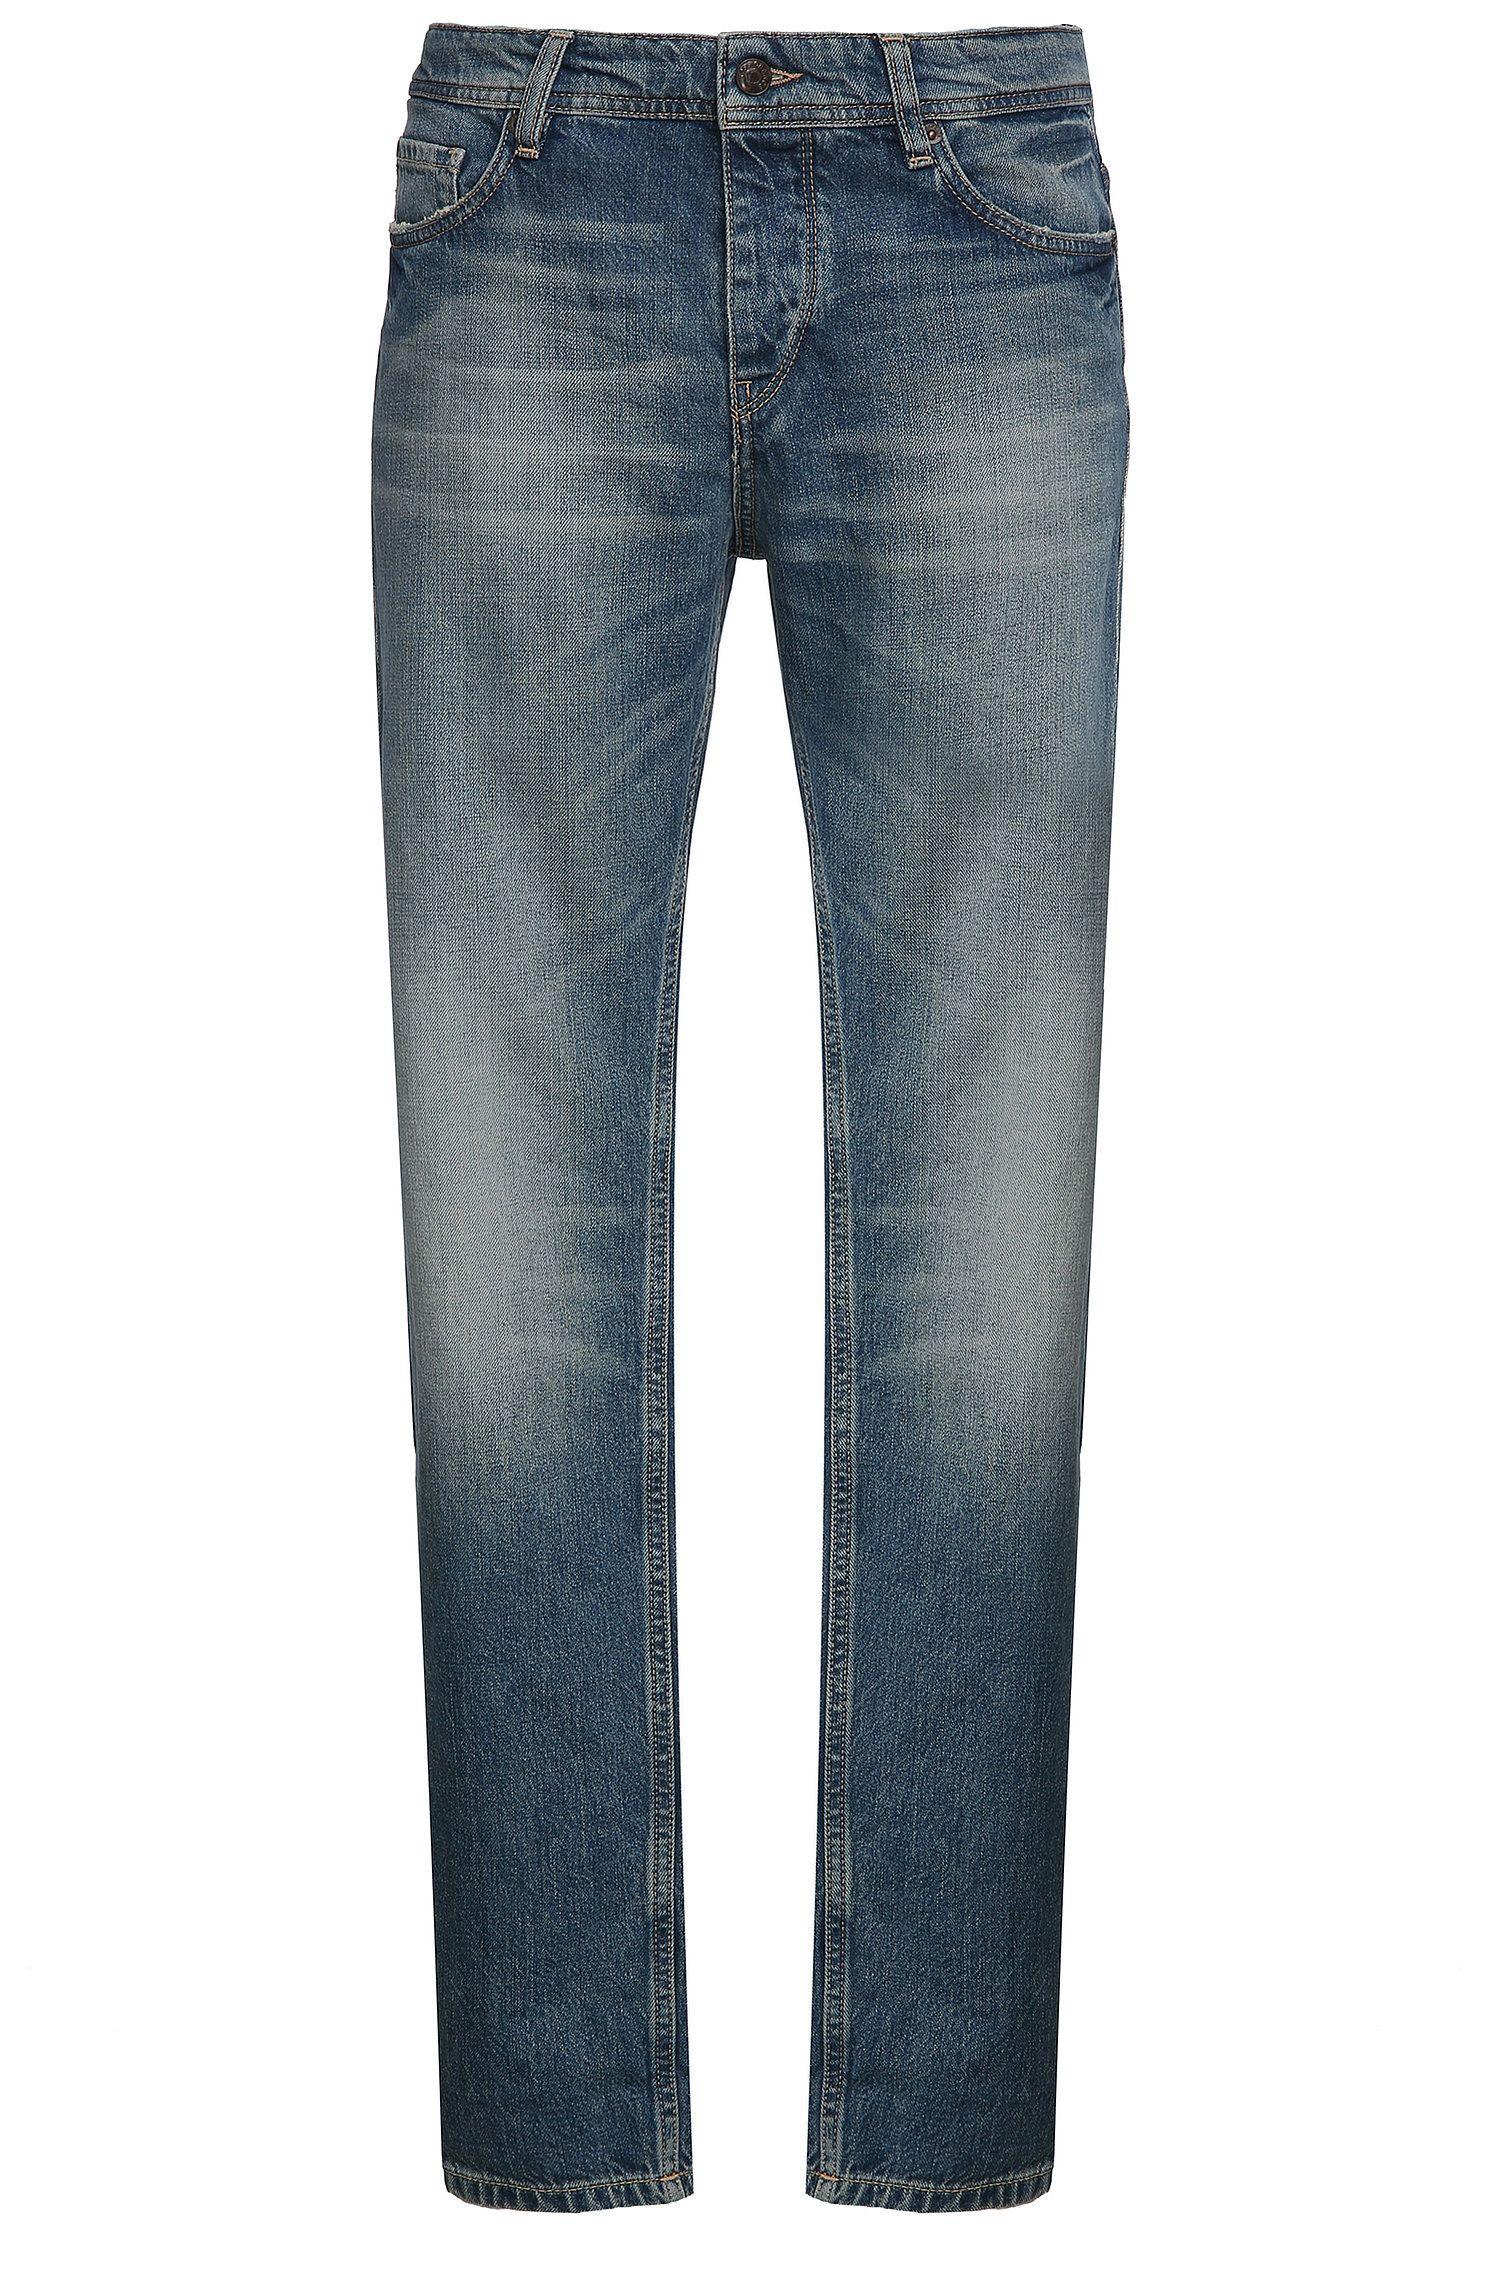 'Orange90' | Tapered Fit, 12 oz Cotton Blend Jeans